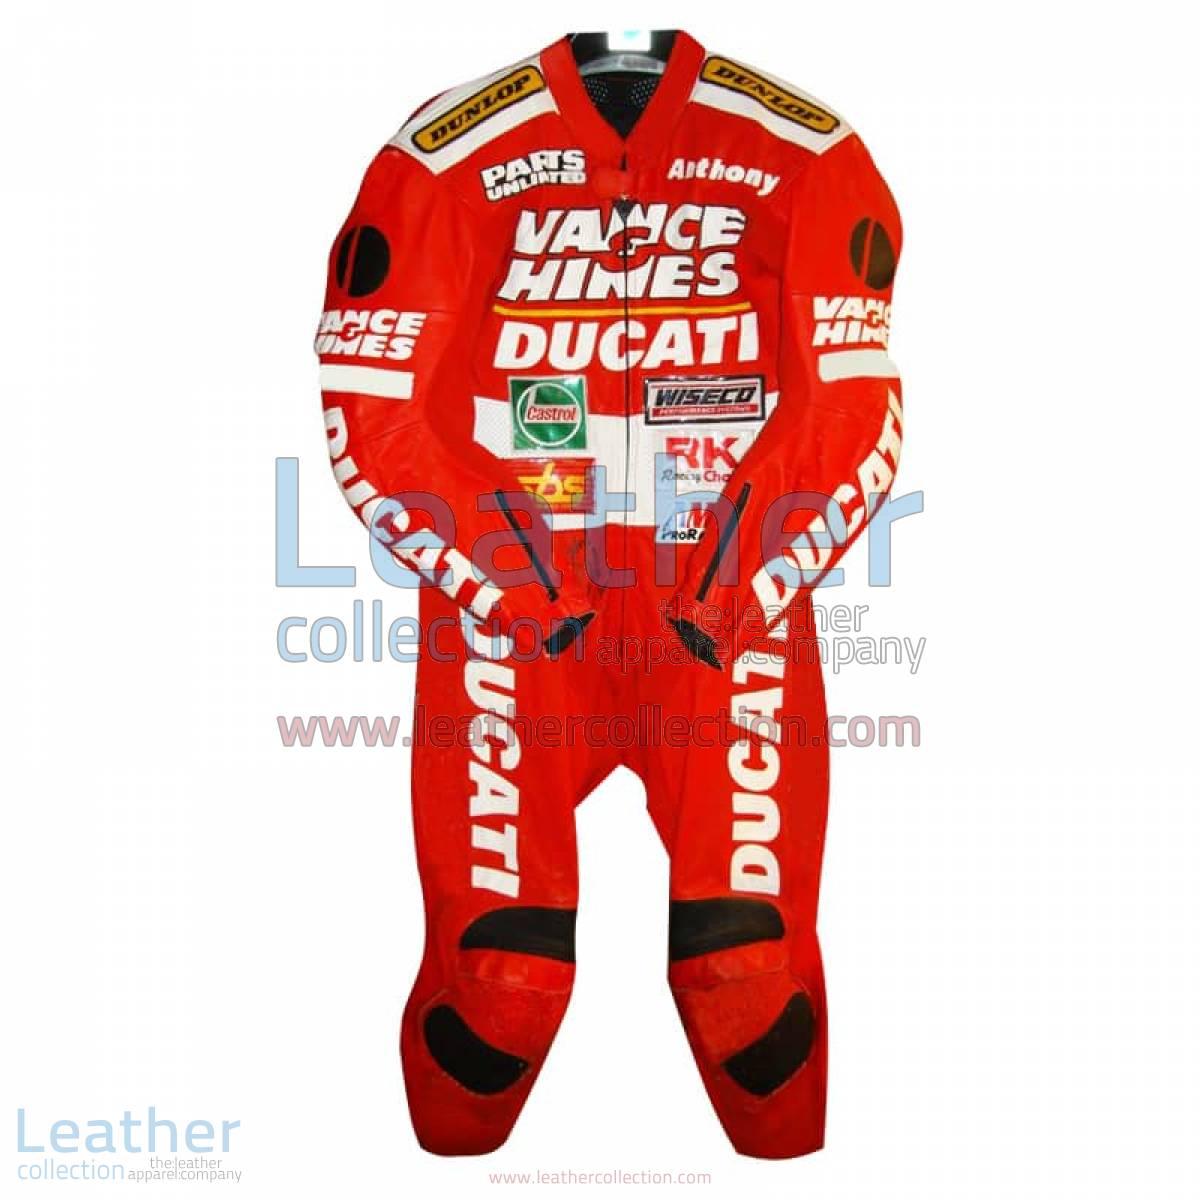 Anthony Gobert Vance & Hines Ducati Leathers 1998 - 1999 AMA | ducati leathers